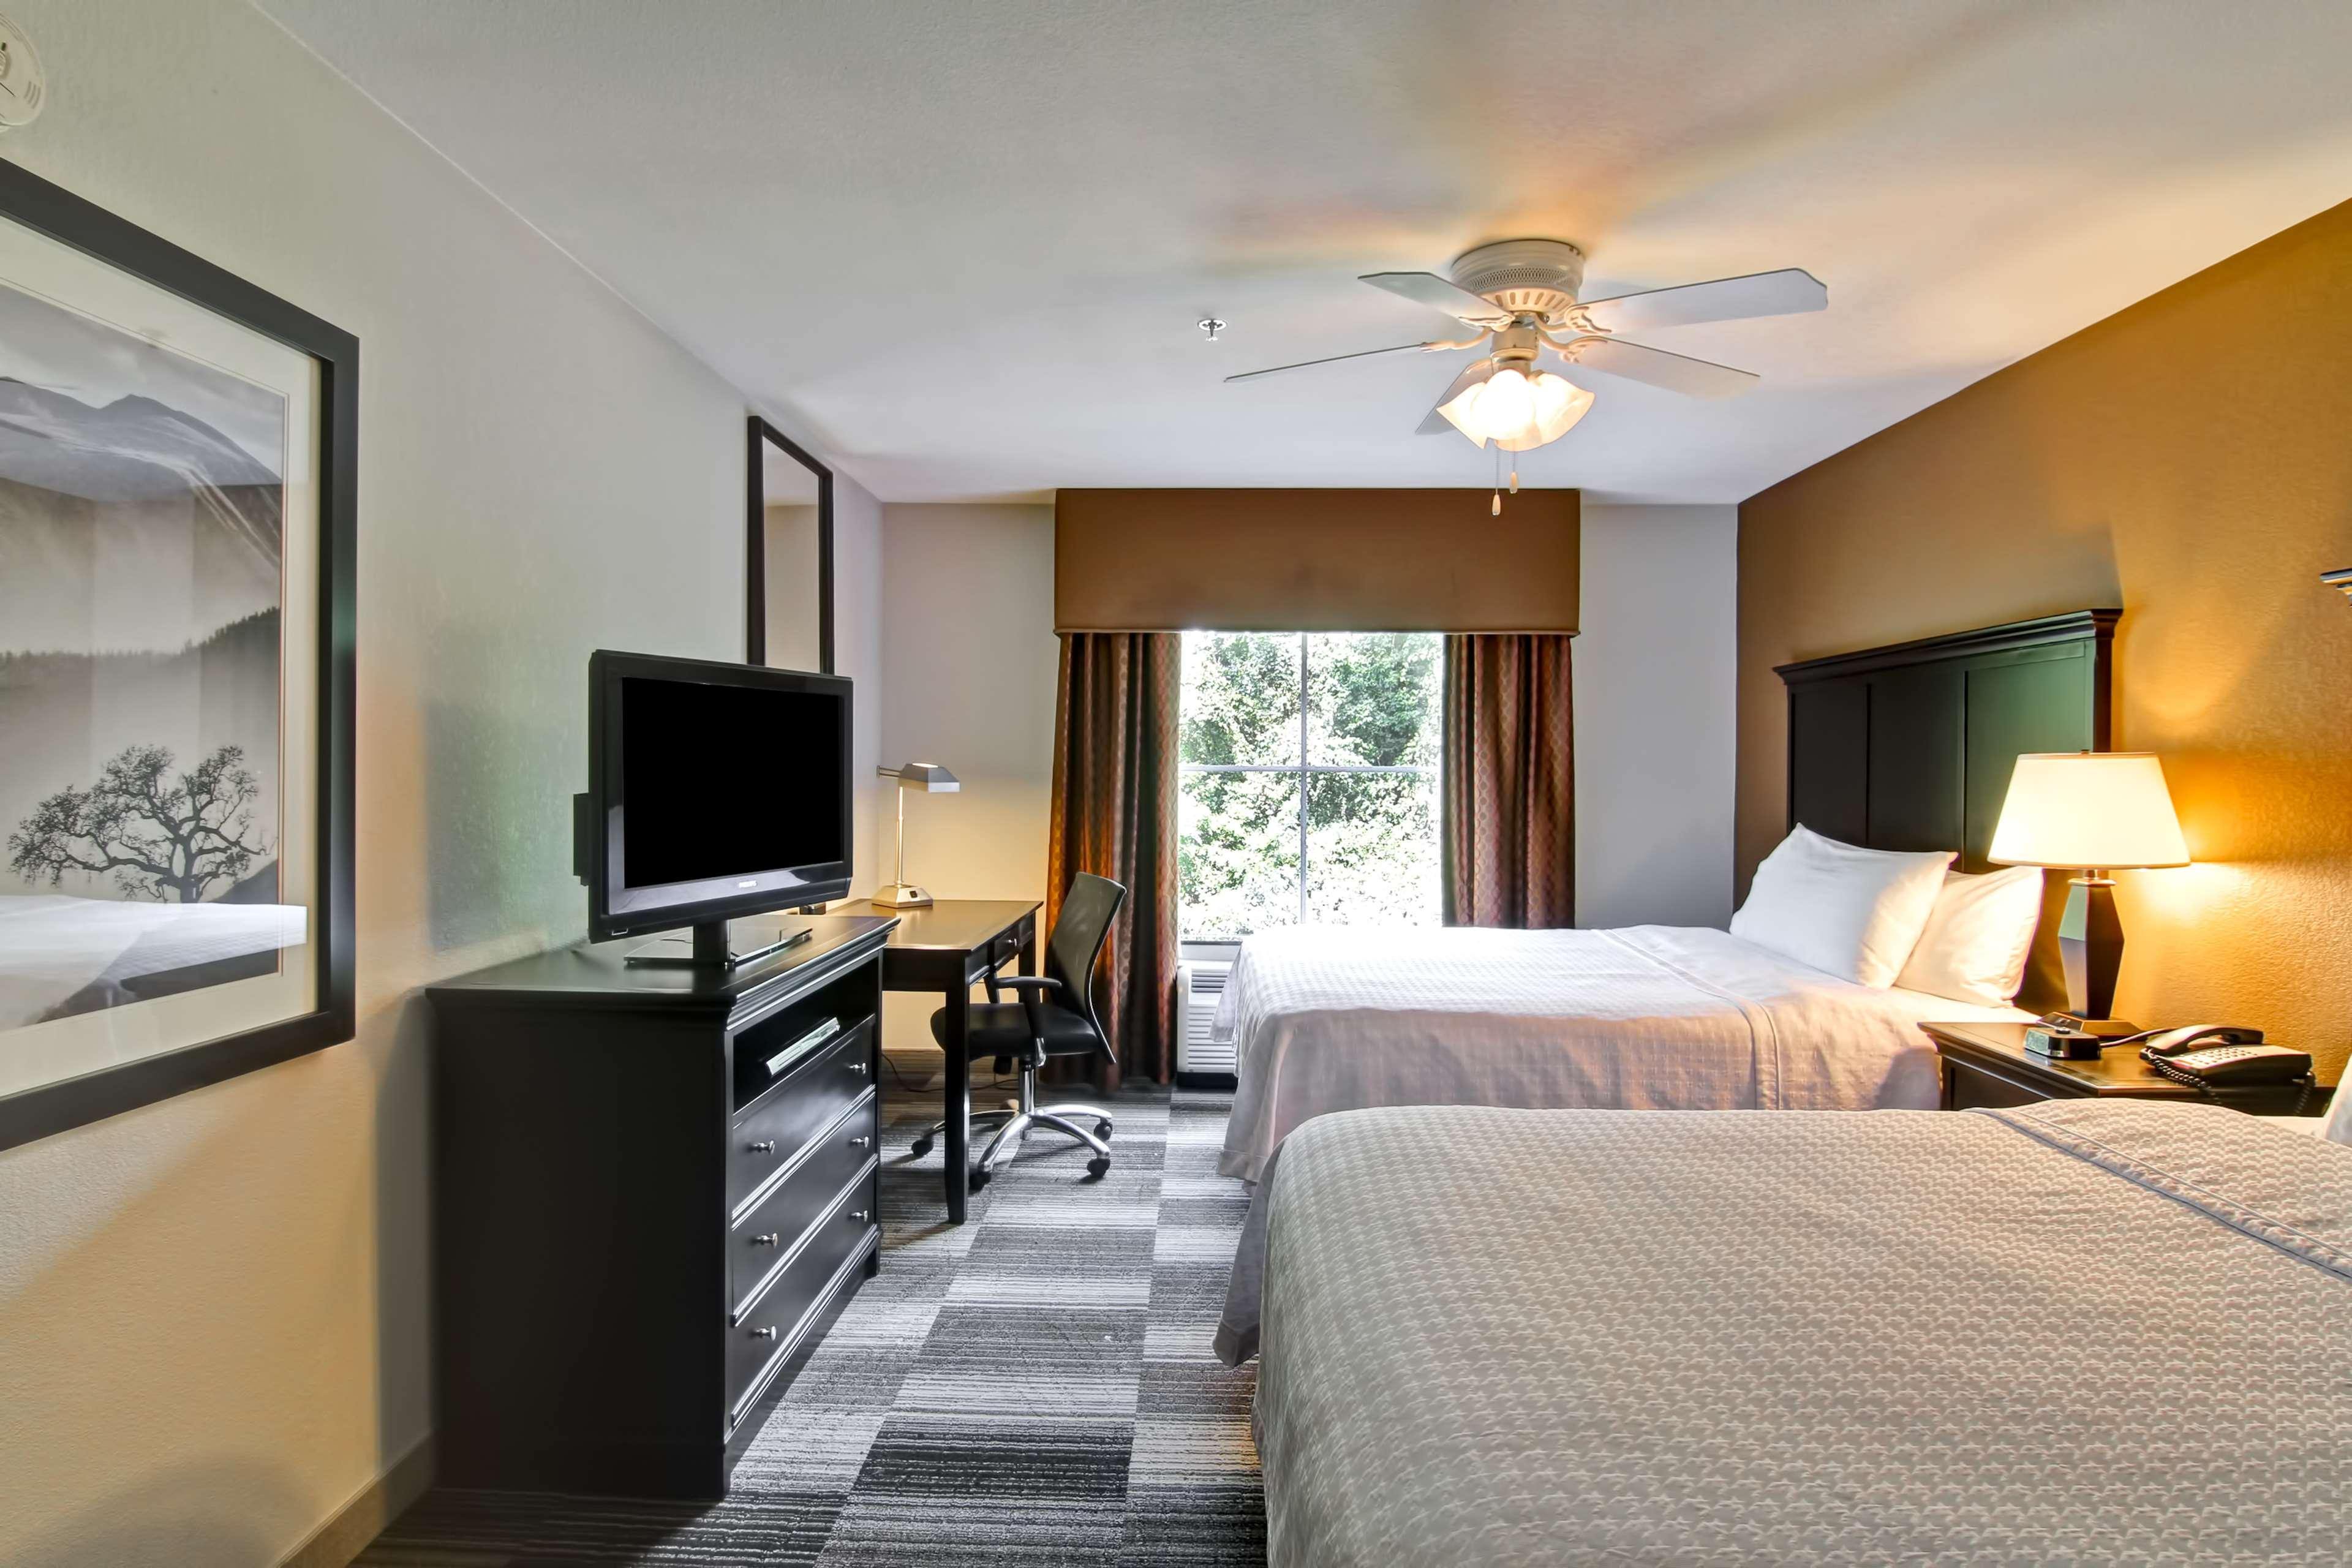 Homewood Suites by Hilton Cincinnati Airport South-Florence image 27